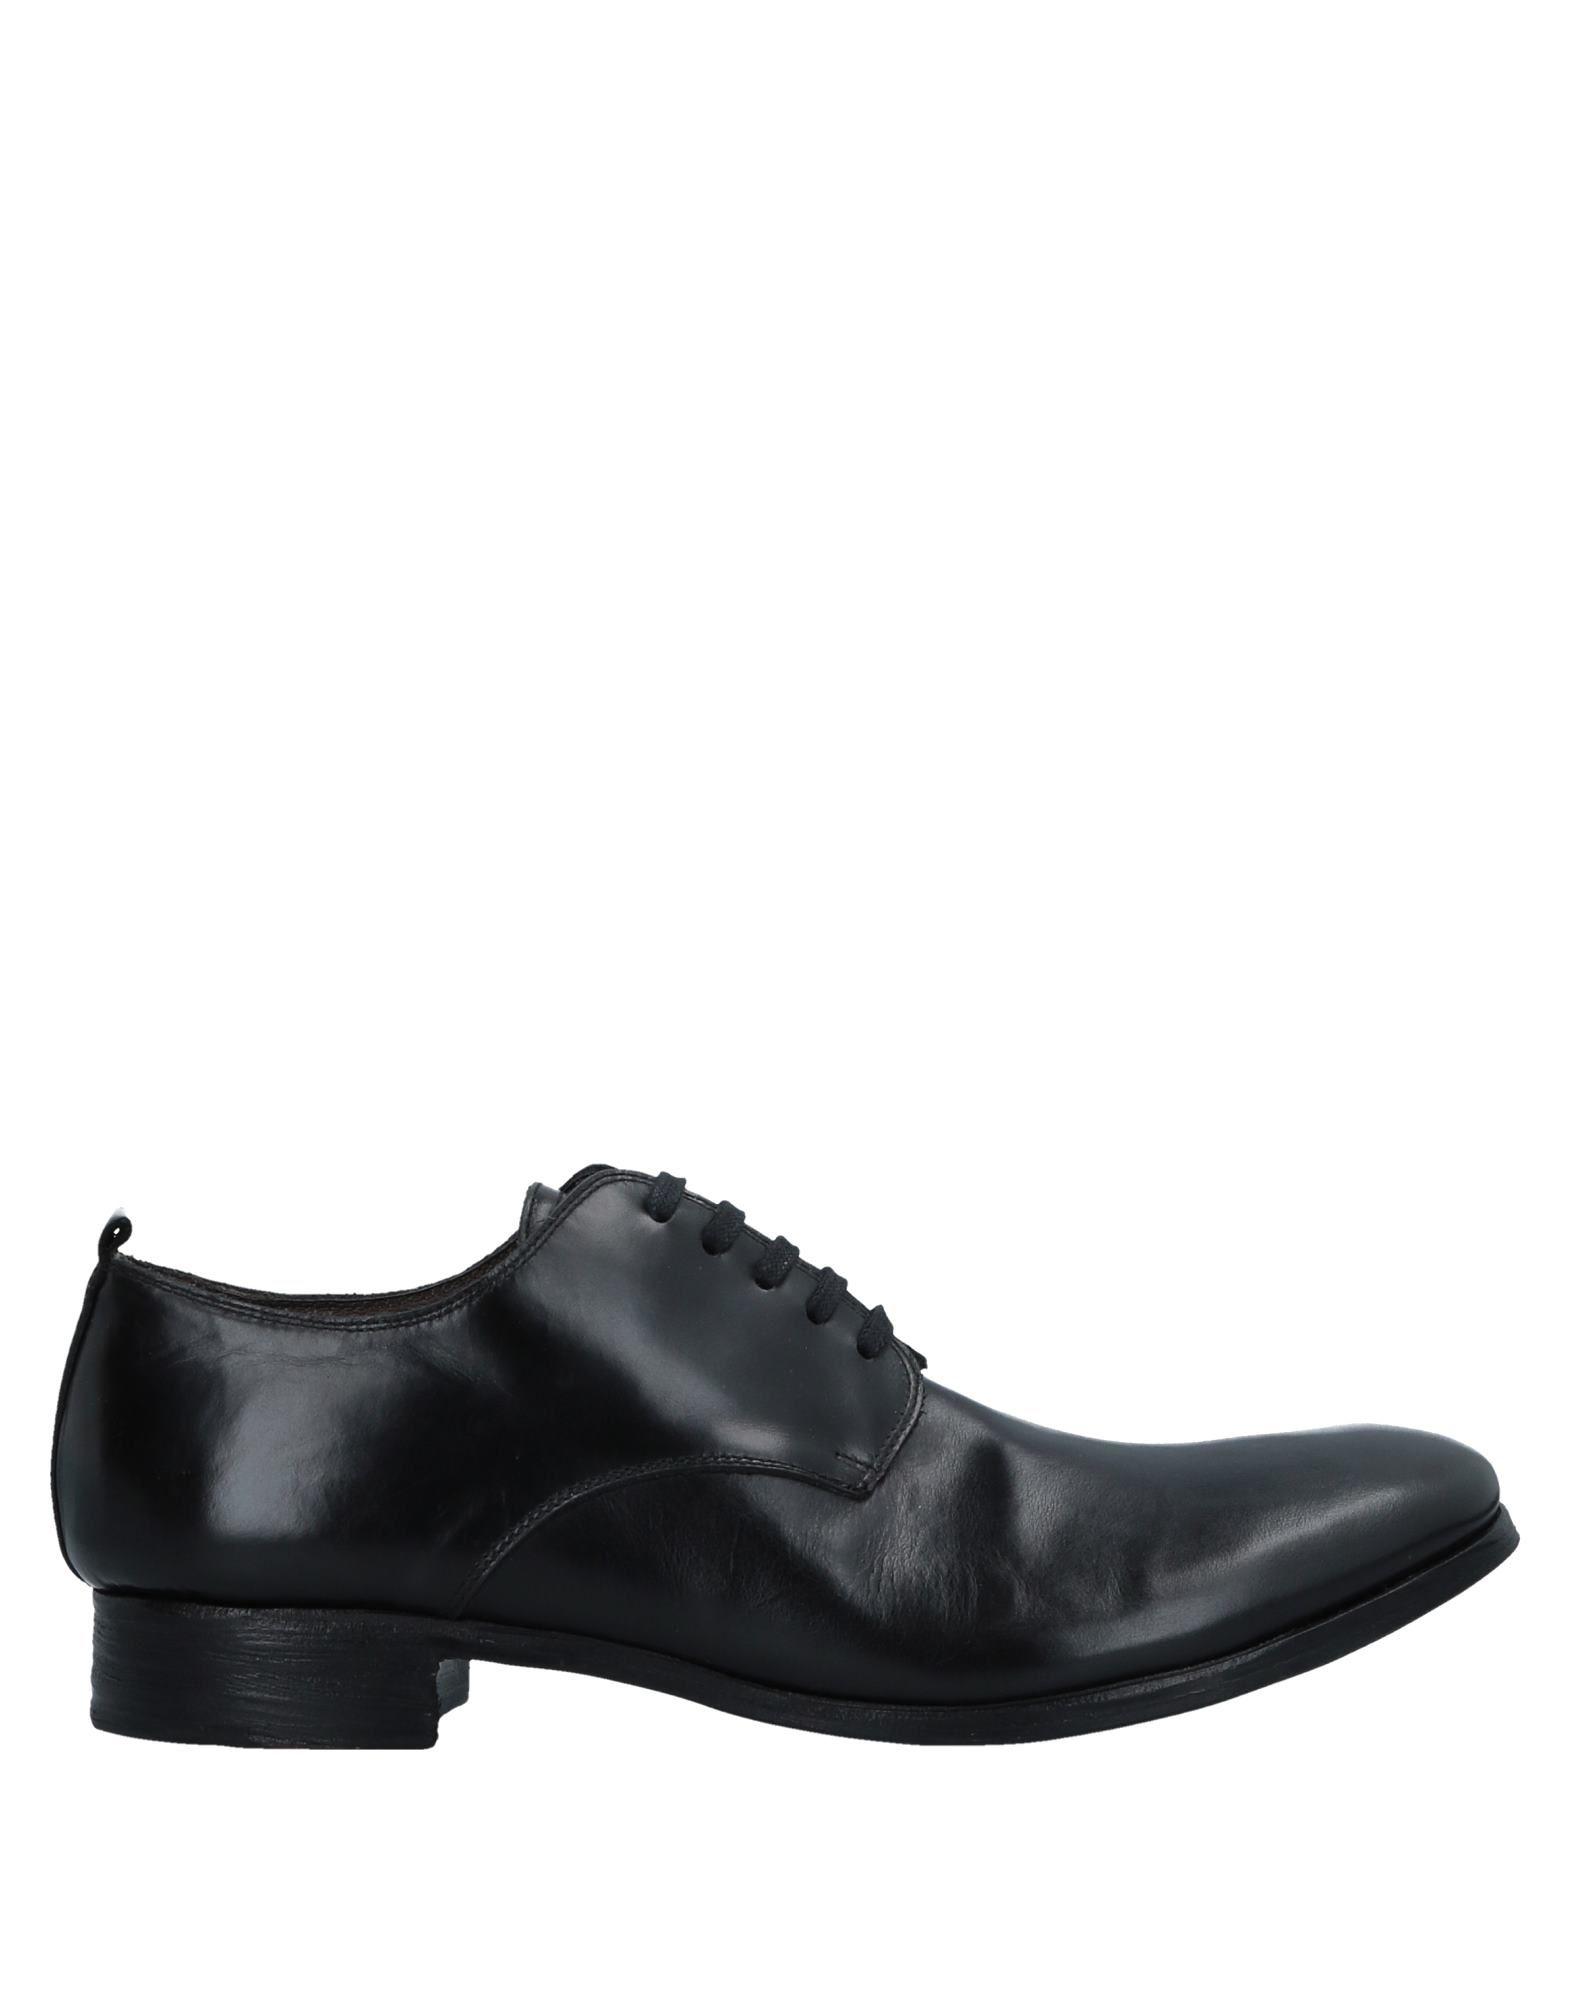 Rocco P. Schnürschuhe Herren  11521304EU Gute Qualität beliebte Schuhe